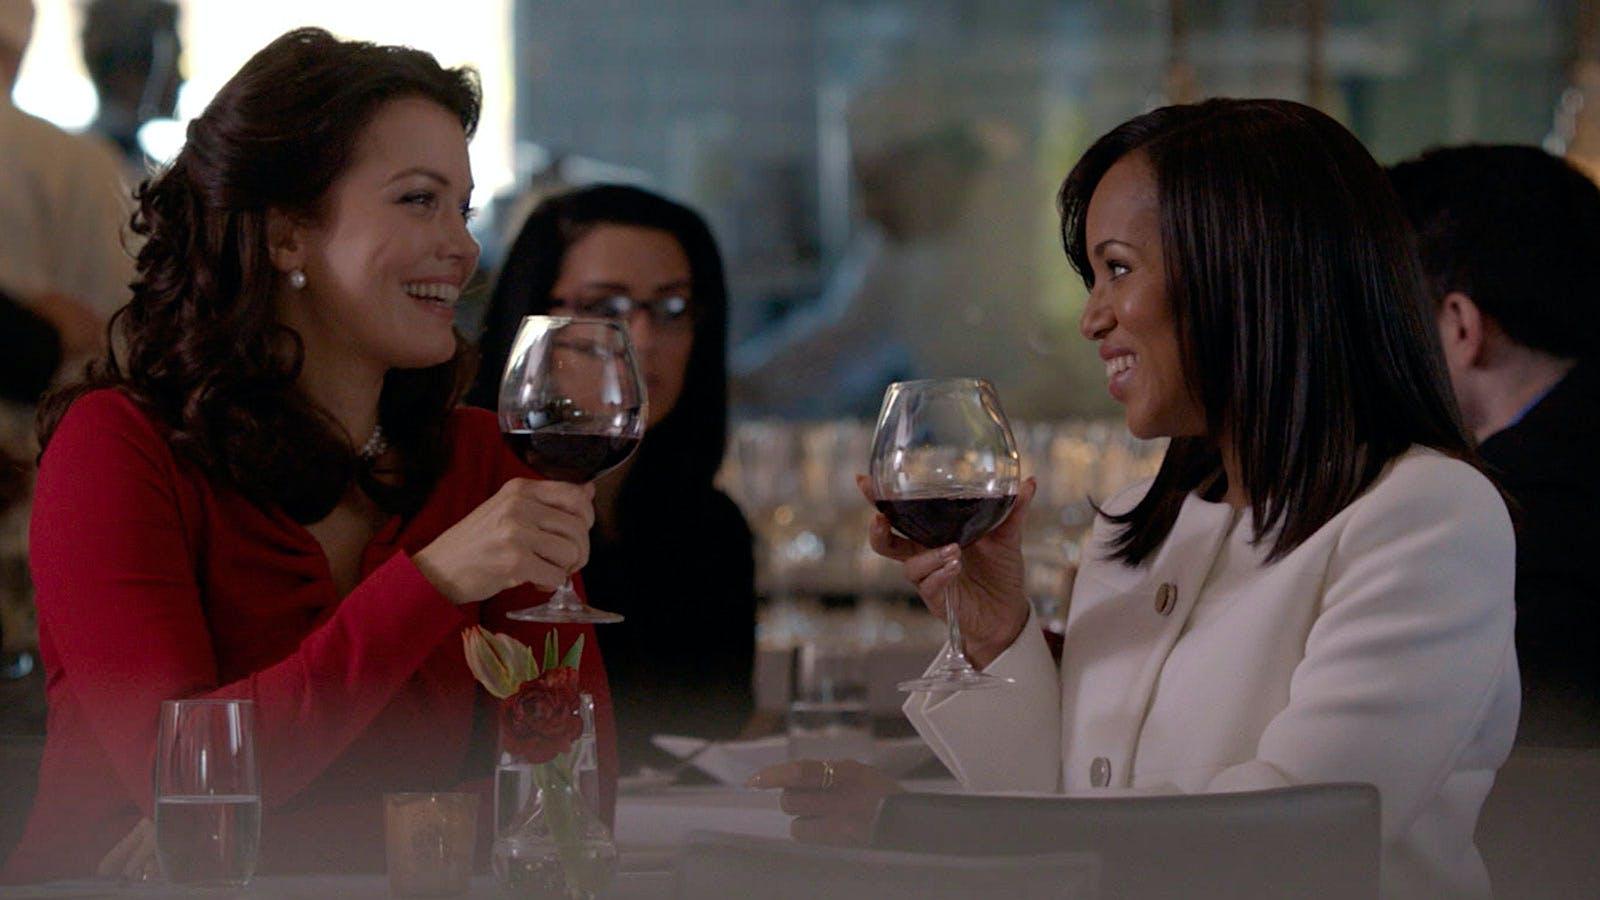 ABC's <i>Scandal</i> Sends Wineglass Sales Soaring